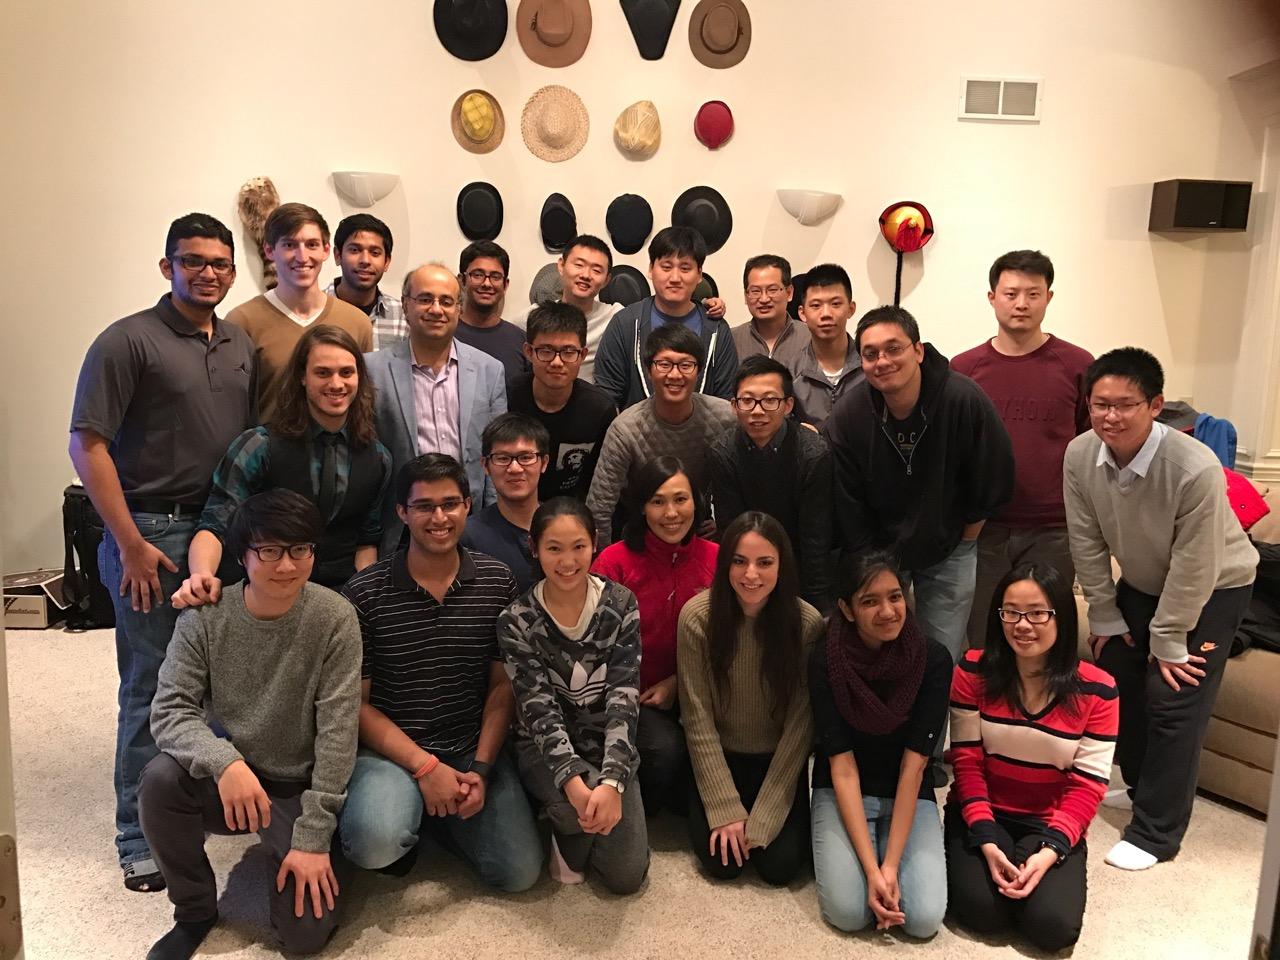 C-Design group photo at Prof. Ramani's home